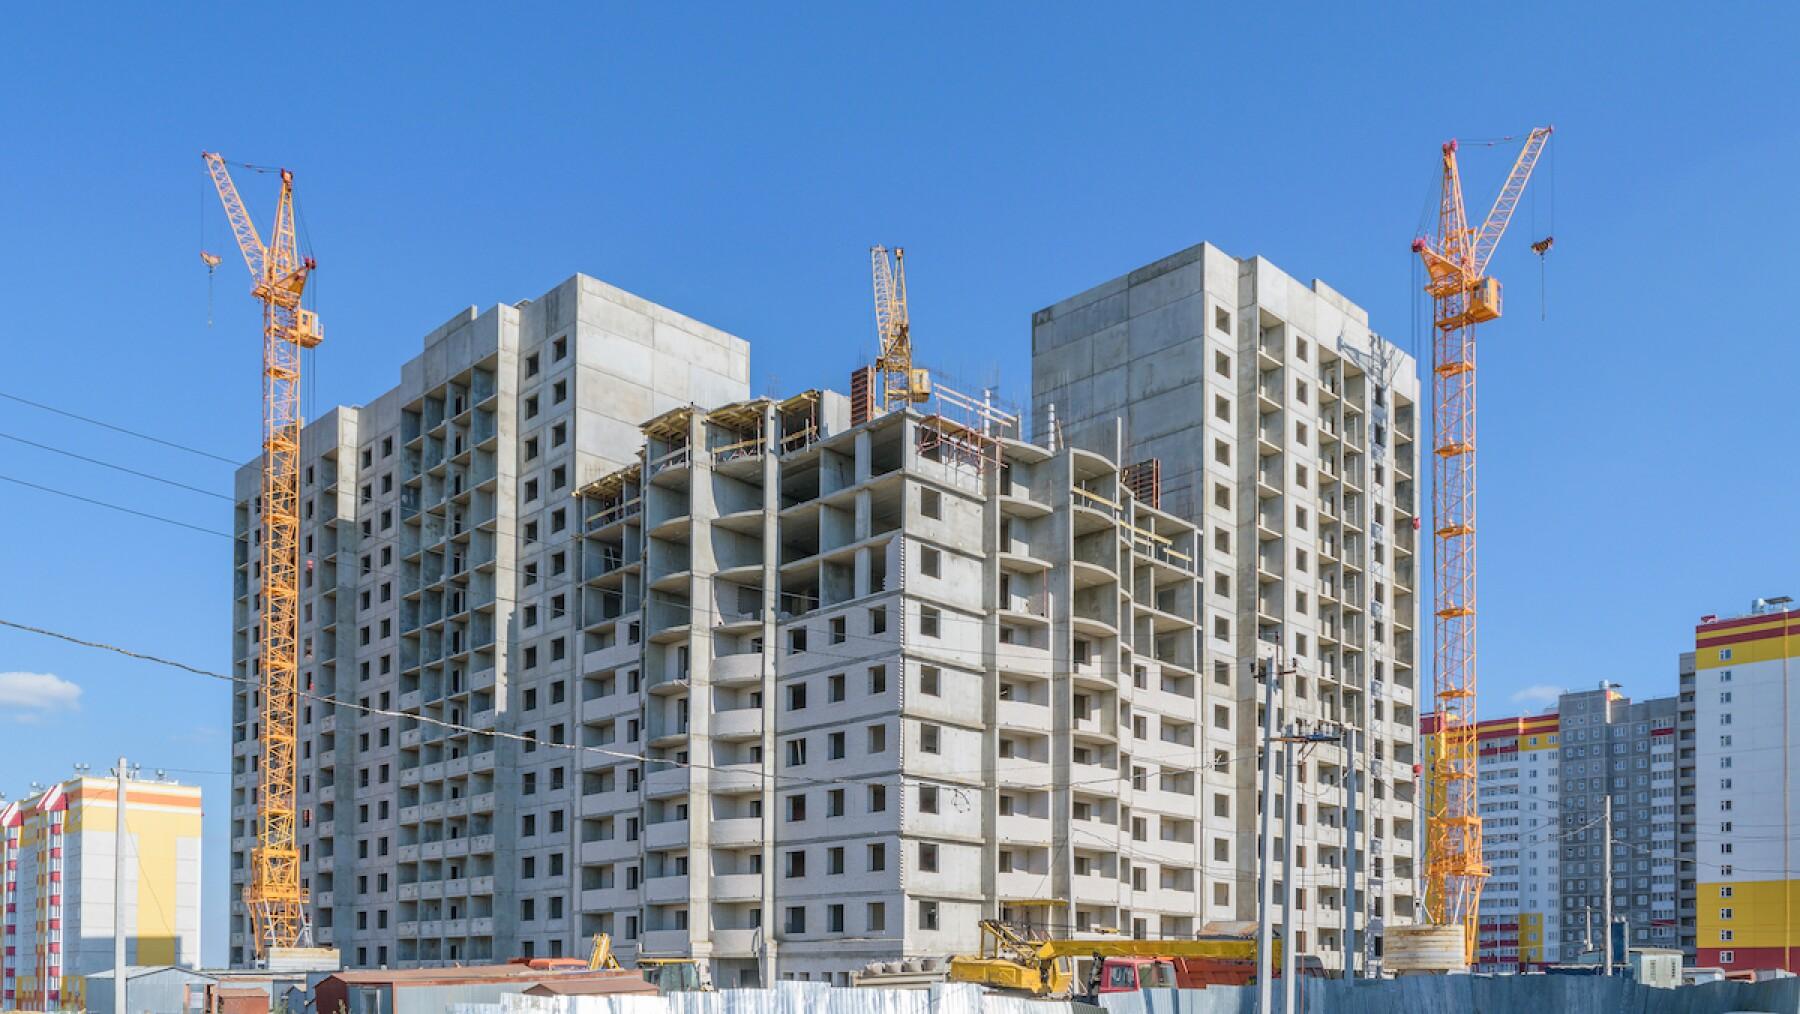 Construction of new multi-storey panel house. Three tower cranes